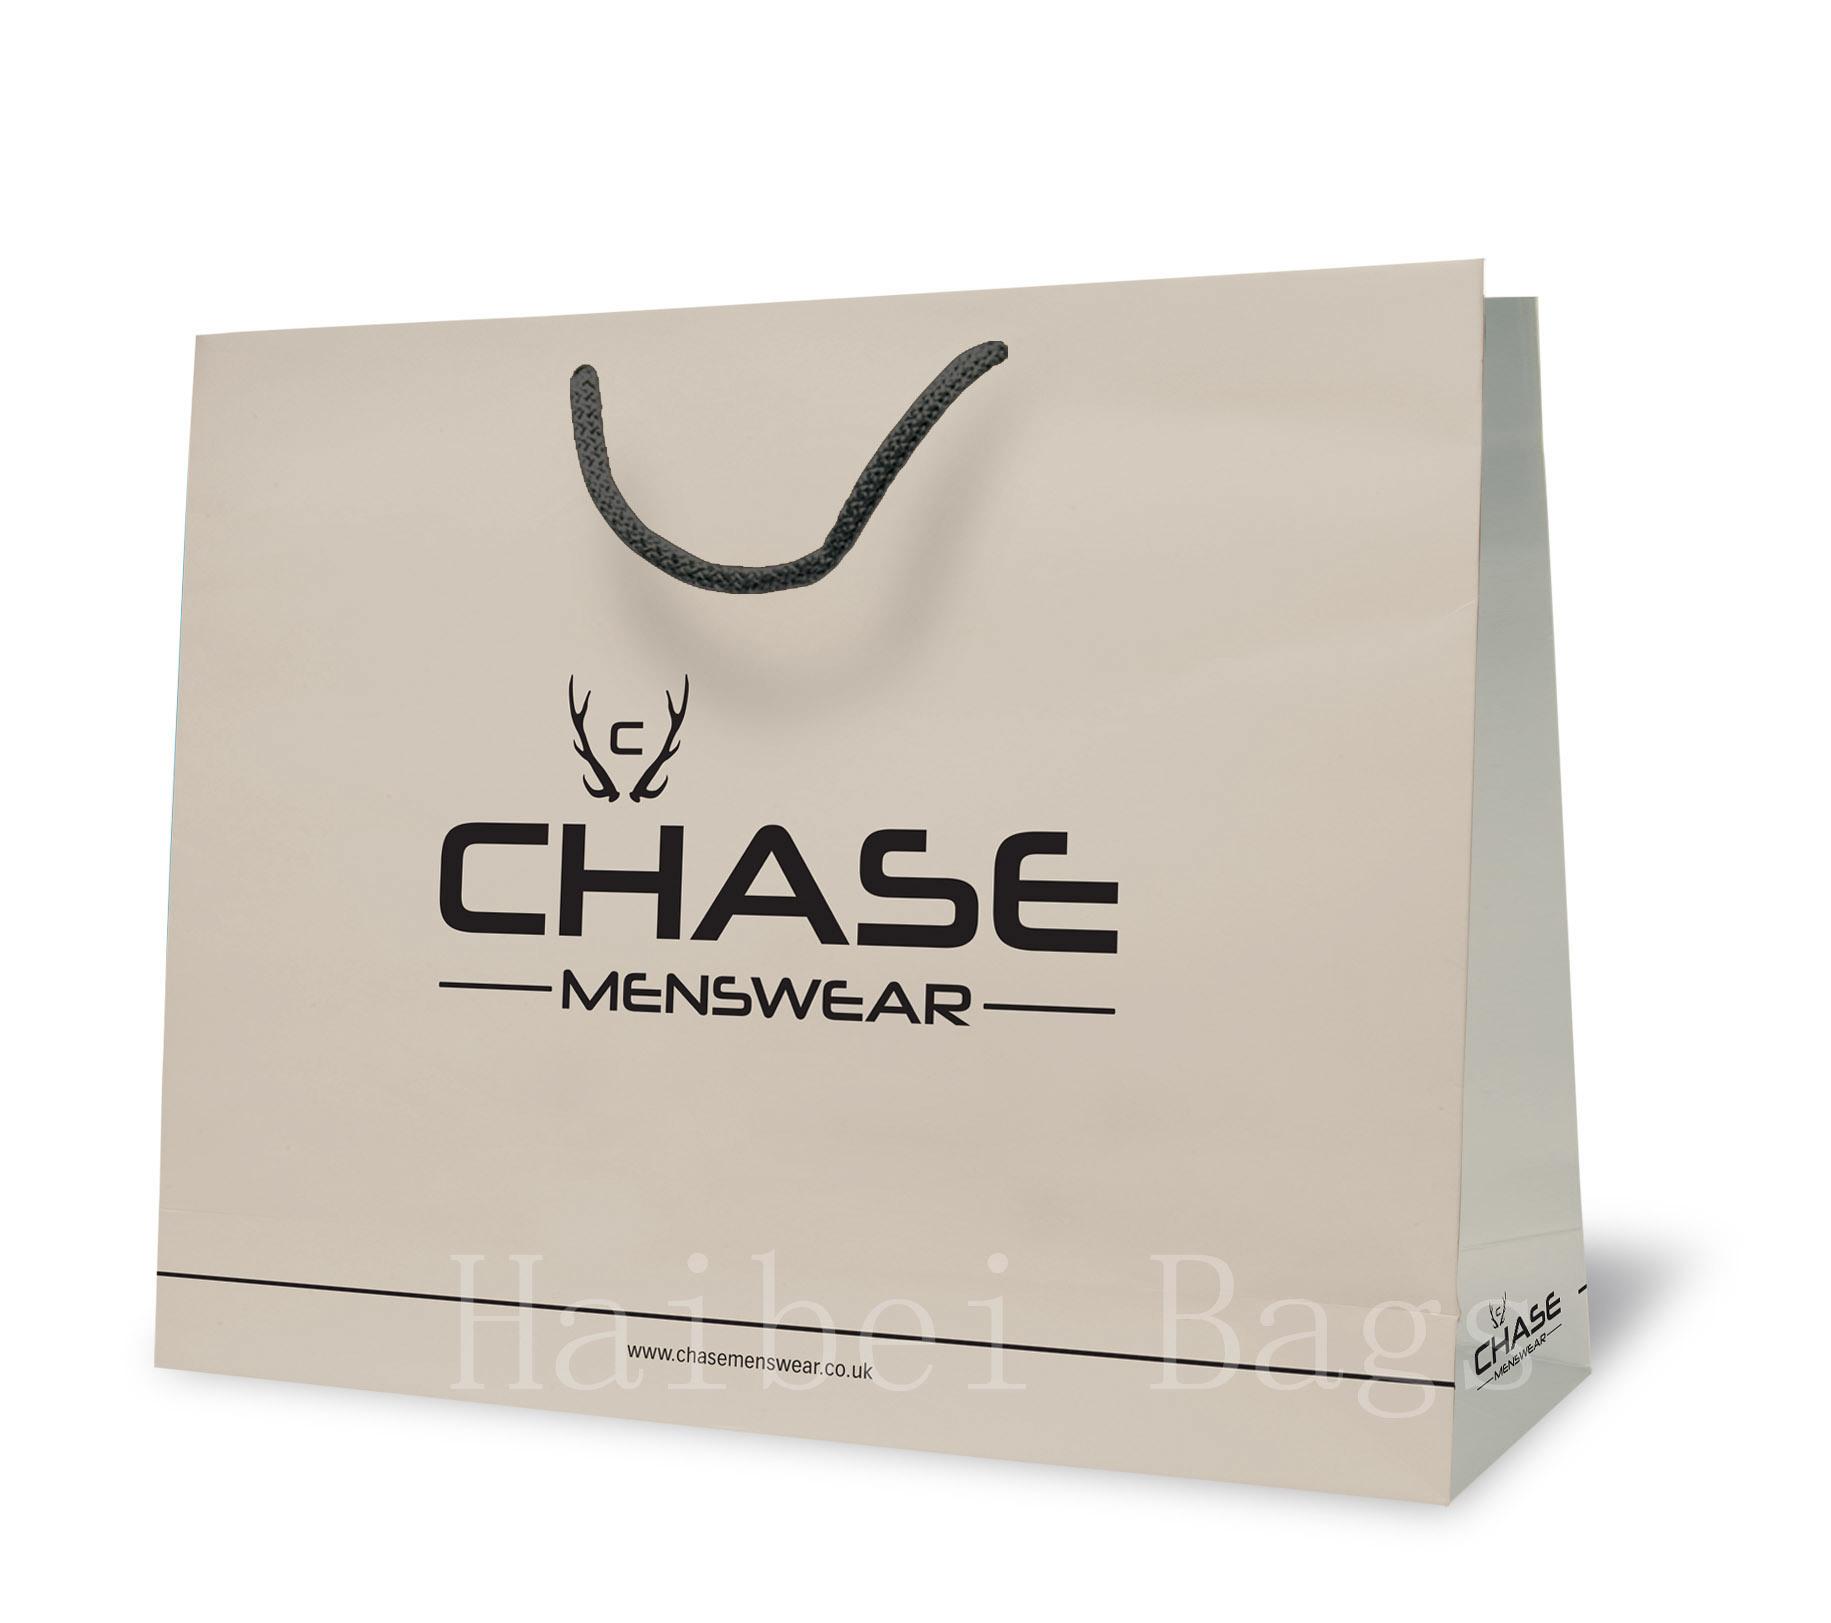 Kraft Paper Gift Shopping Bag for Packaging (HBPB-67)